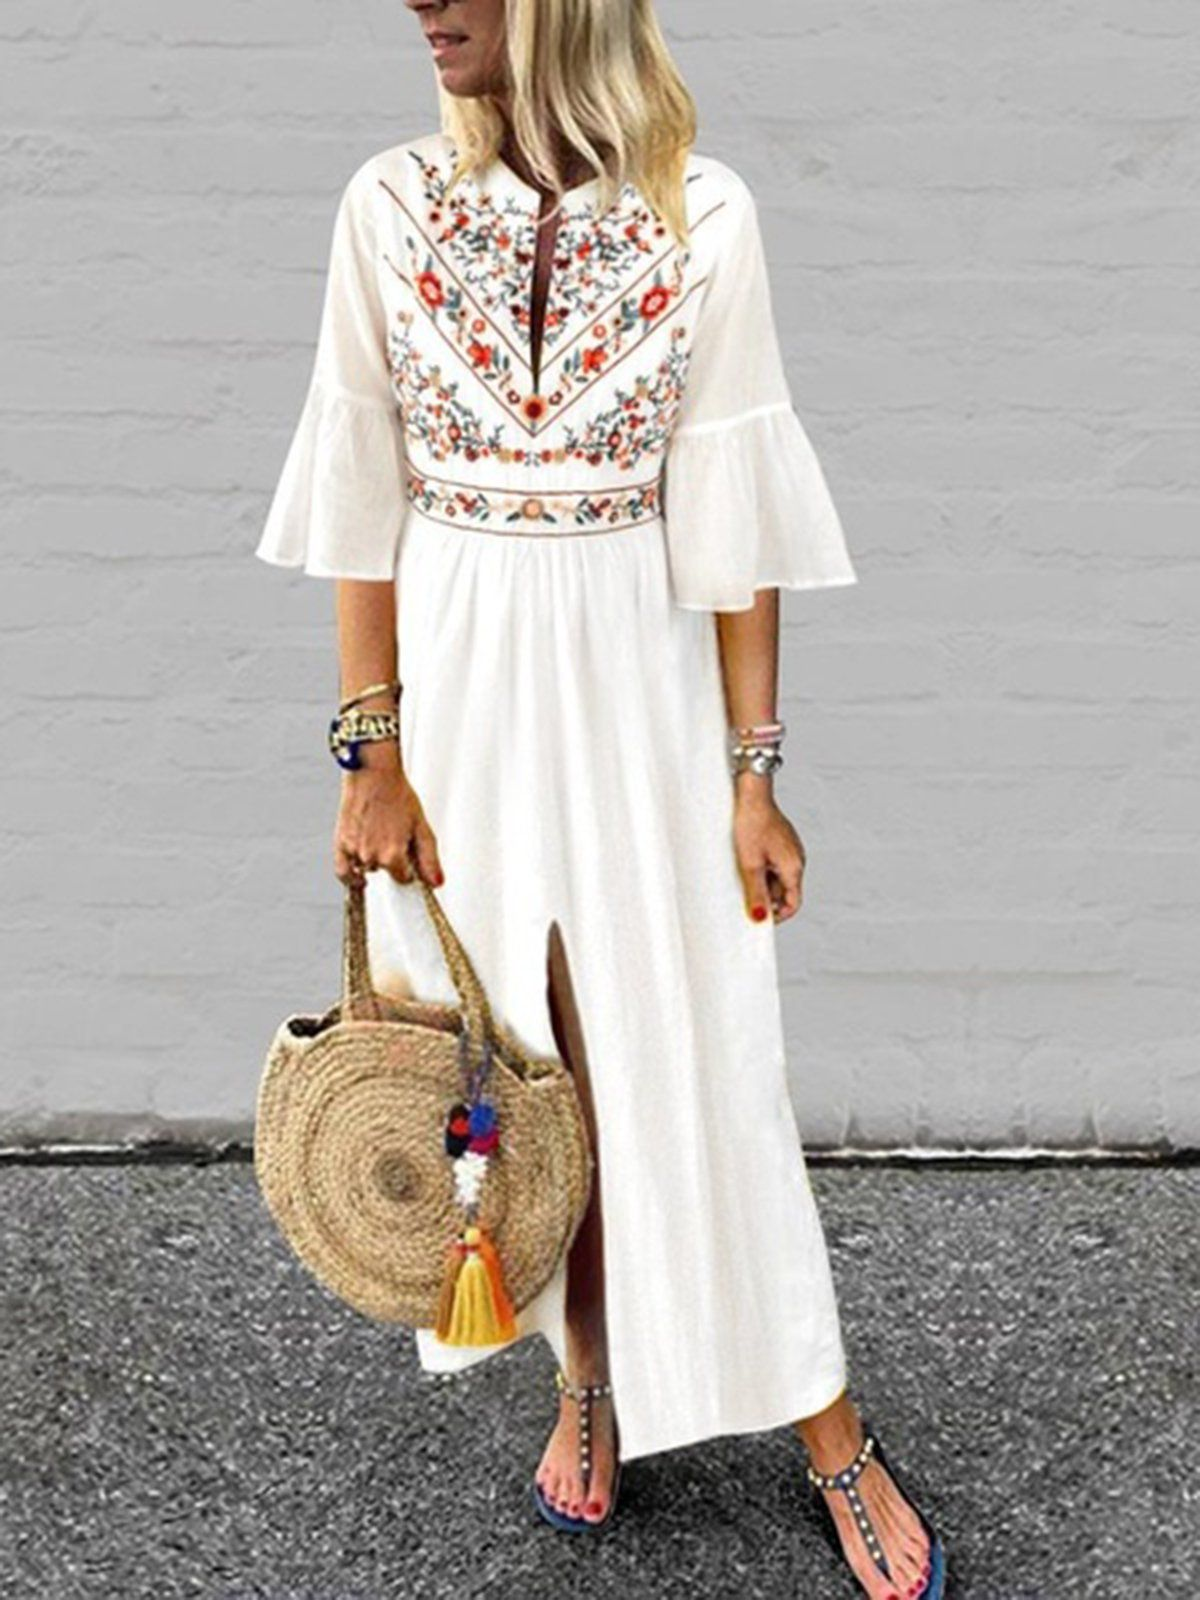 cfdb3964626 Mostata Summer Dresses Casual V Neck Floral A-Line Dress-Mostata.com